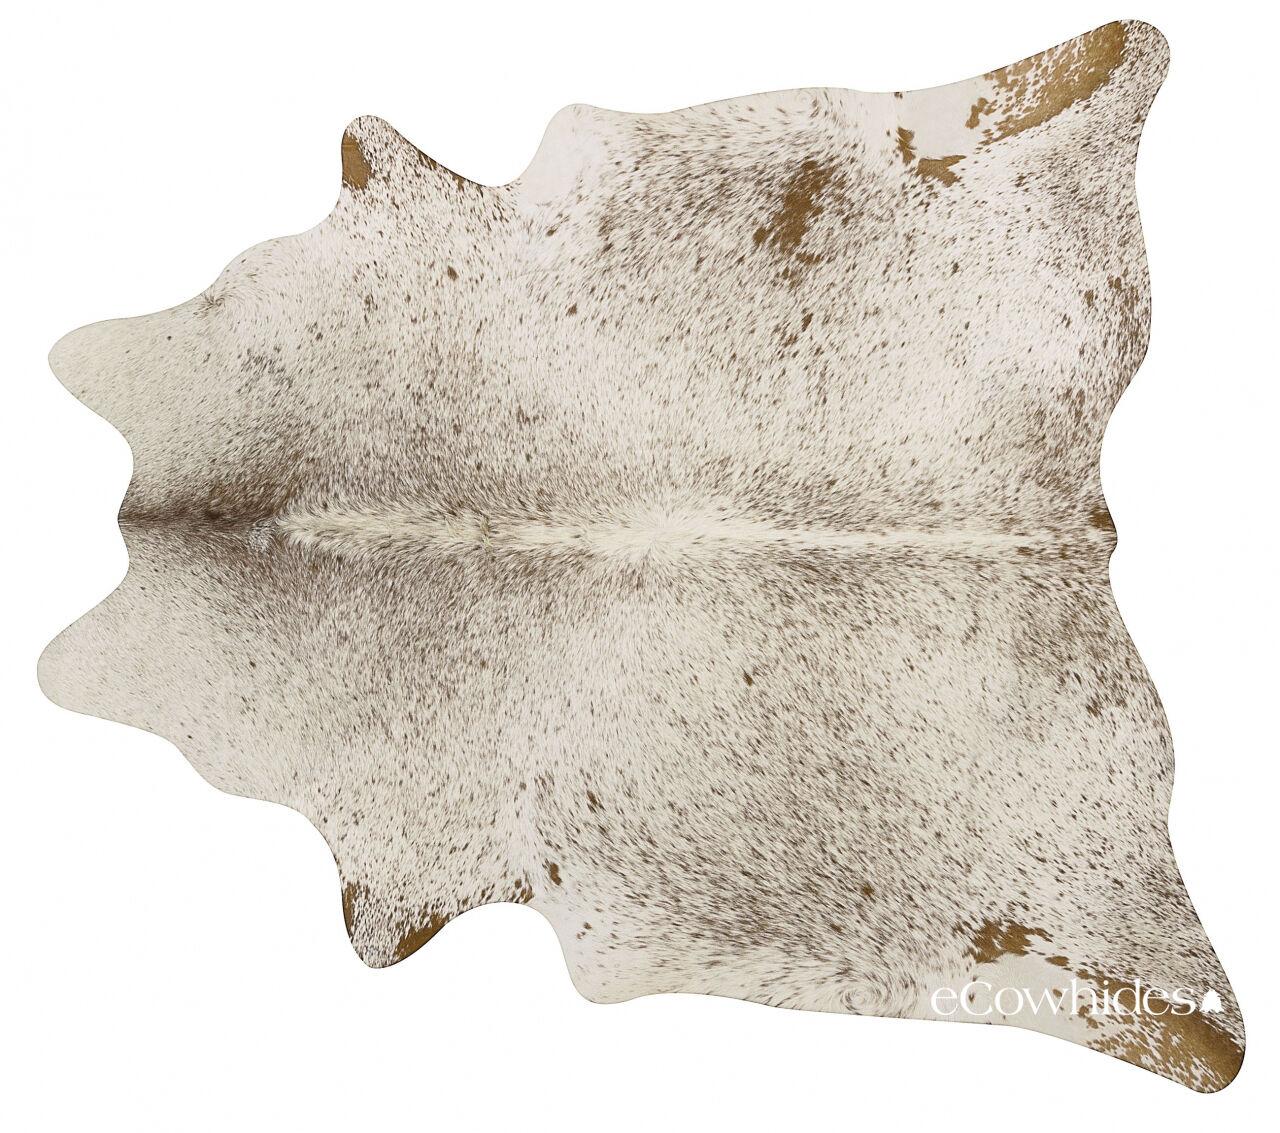 Salt and Pepper Marronee Brazilian Cowhide Rug Cow Hide Area Rugs